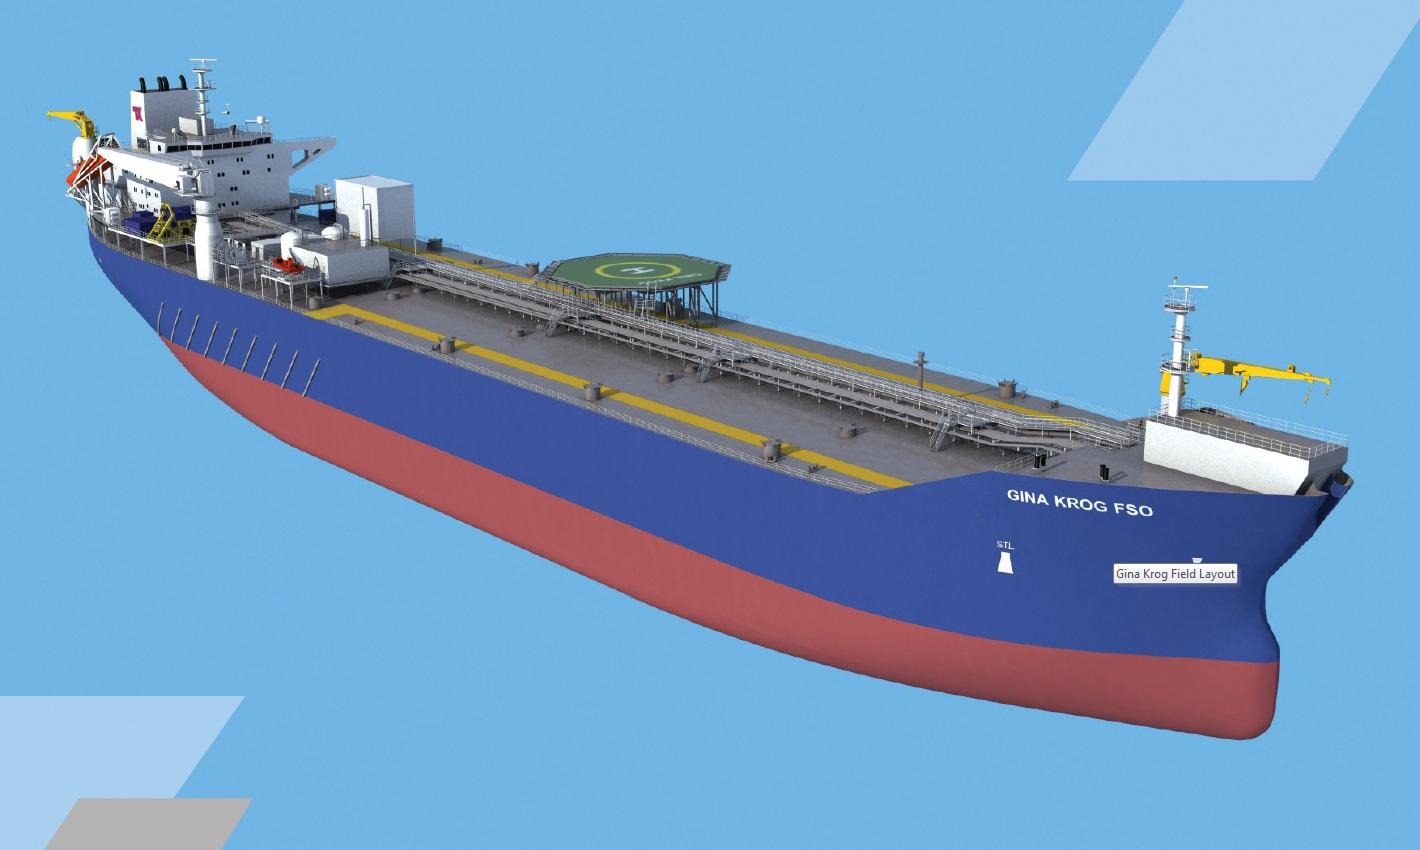 sc 1 st  Teekay & From Rangrid Shuttle Tanker to Gina Krog FSO - Teekay | Teekay